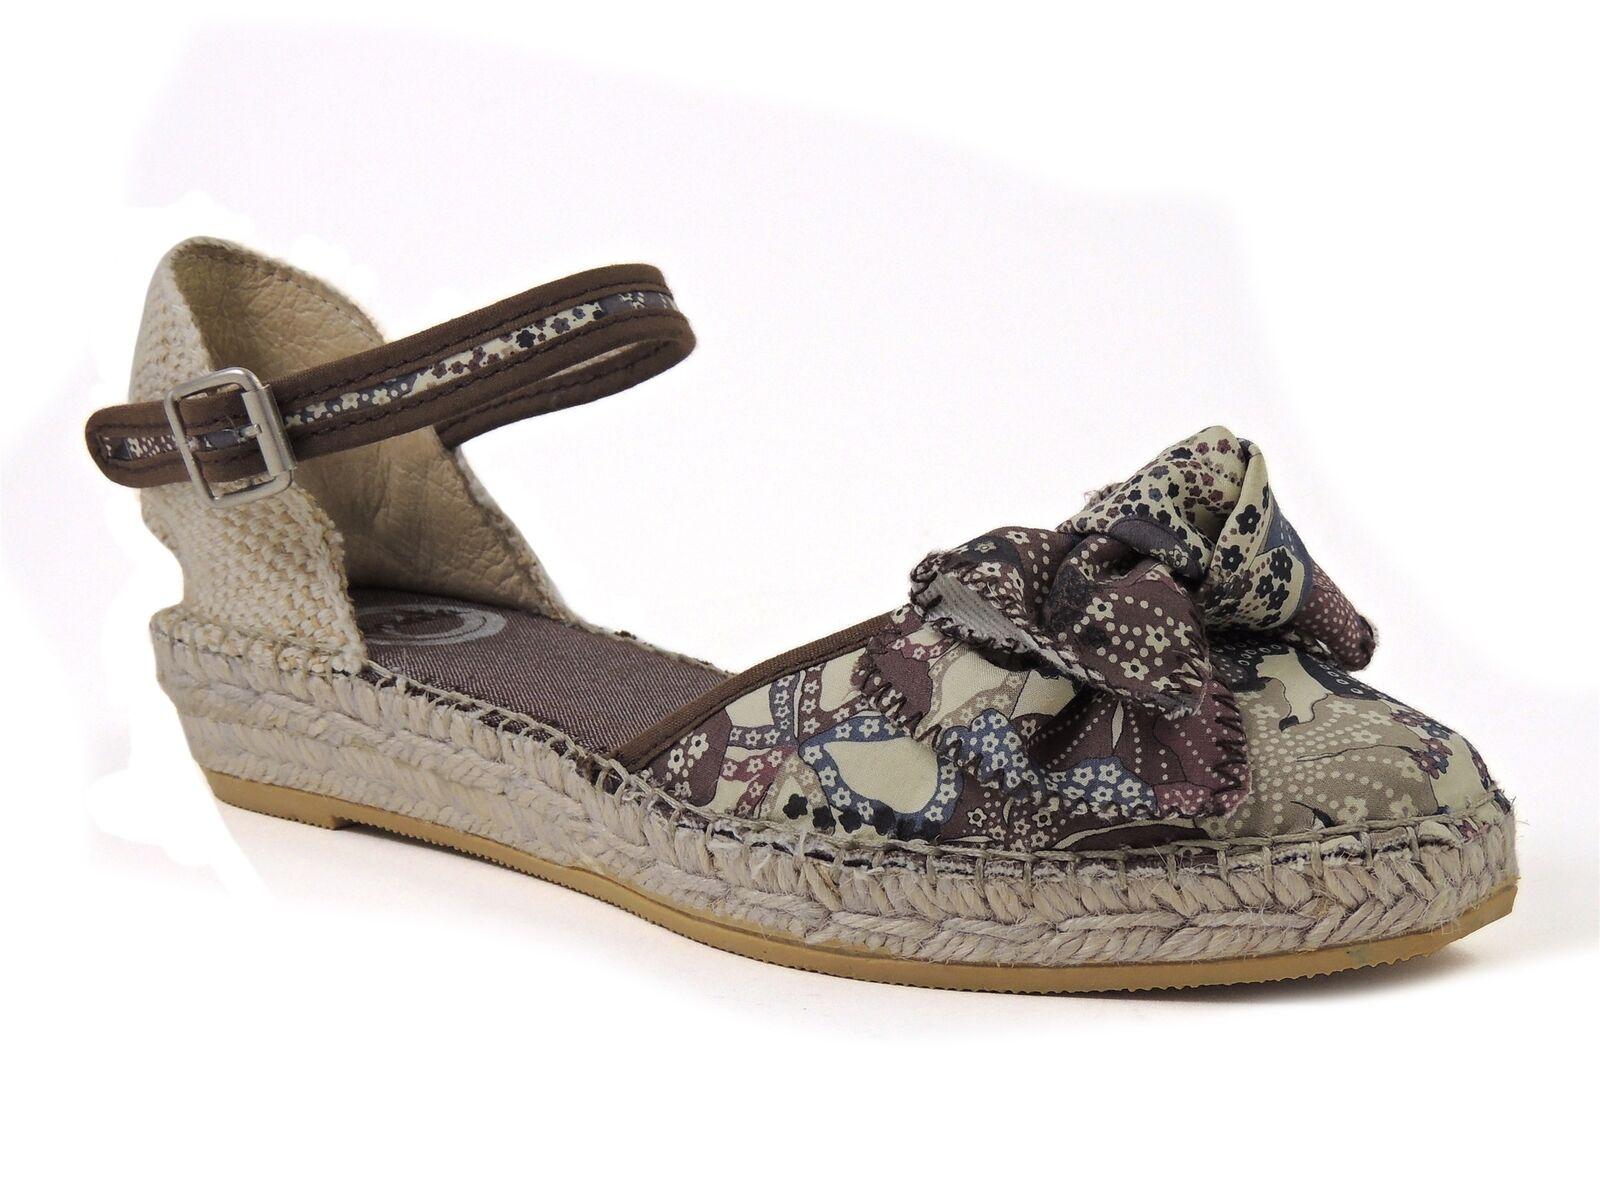 Vidorreta Women's Cosmo Platform Sandals Brown Floral Euro Size 41